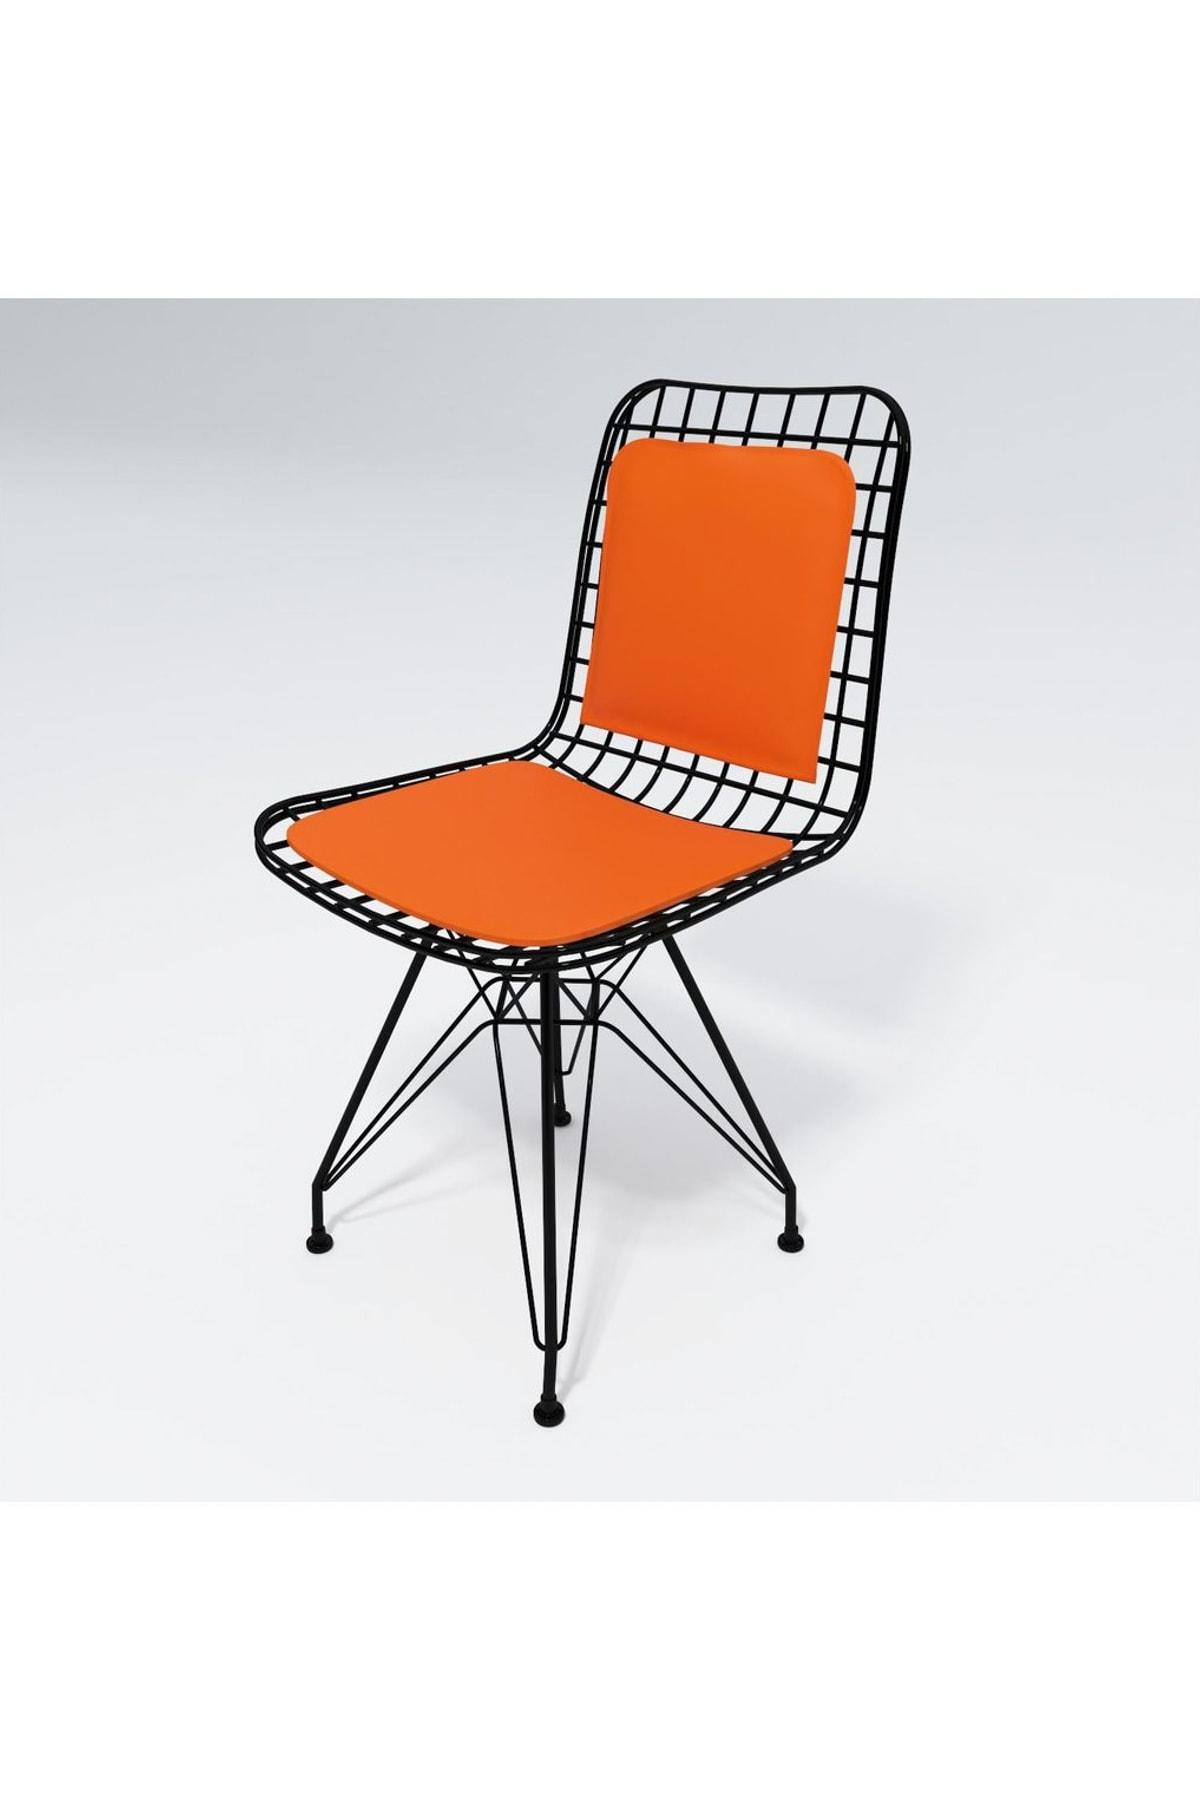 Kenzlife Knsz kafes tel sandalyesi 1 li mazlum syhtrn sırt minderli ofis cafe bahçe mutfak